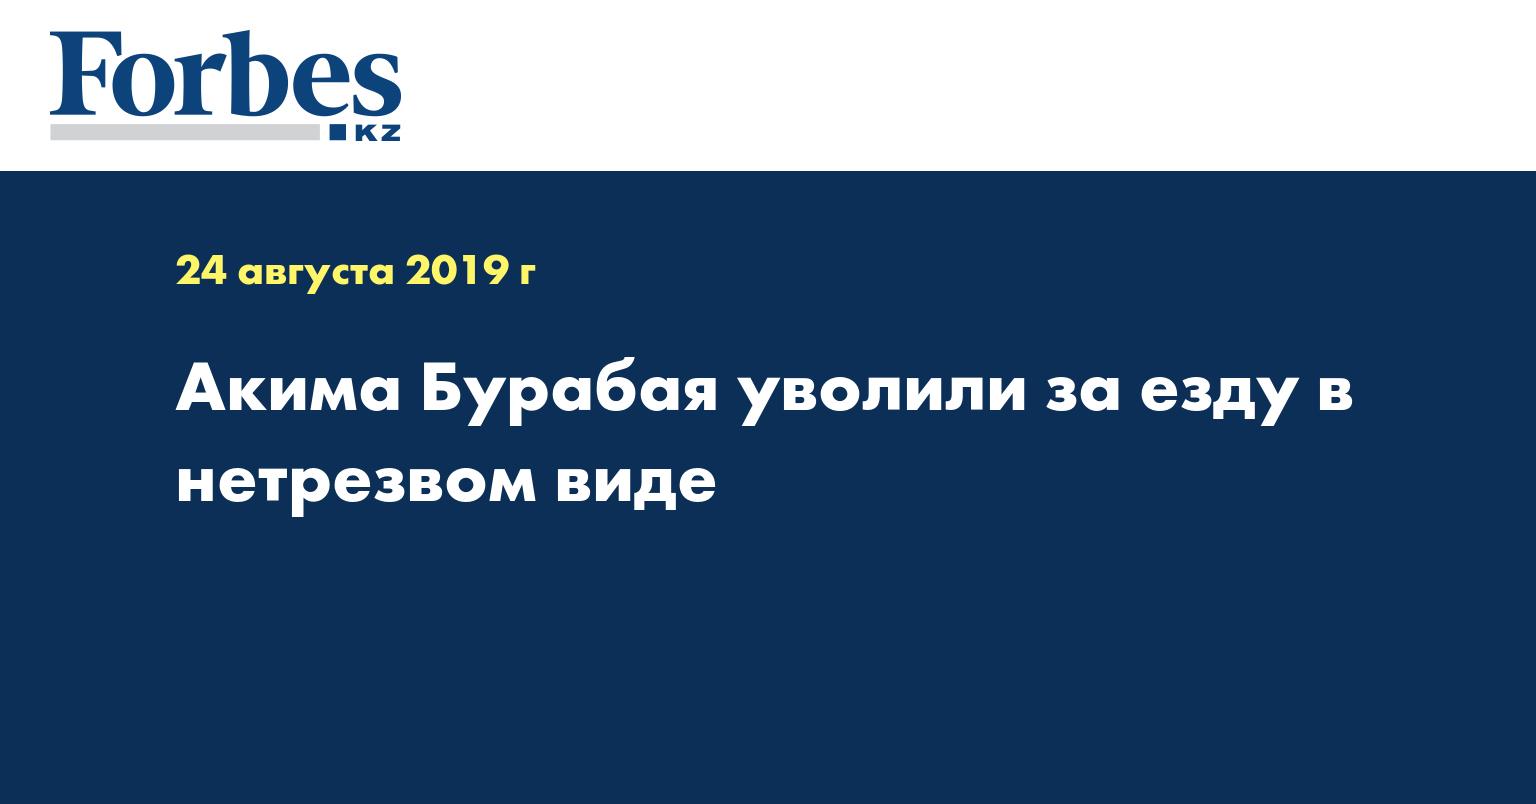 Акима Бурабая уволили за езду в нетрезвом виде